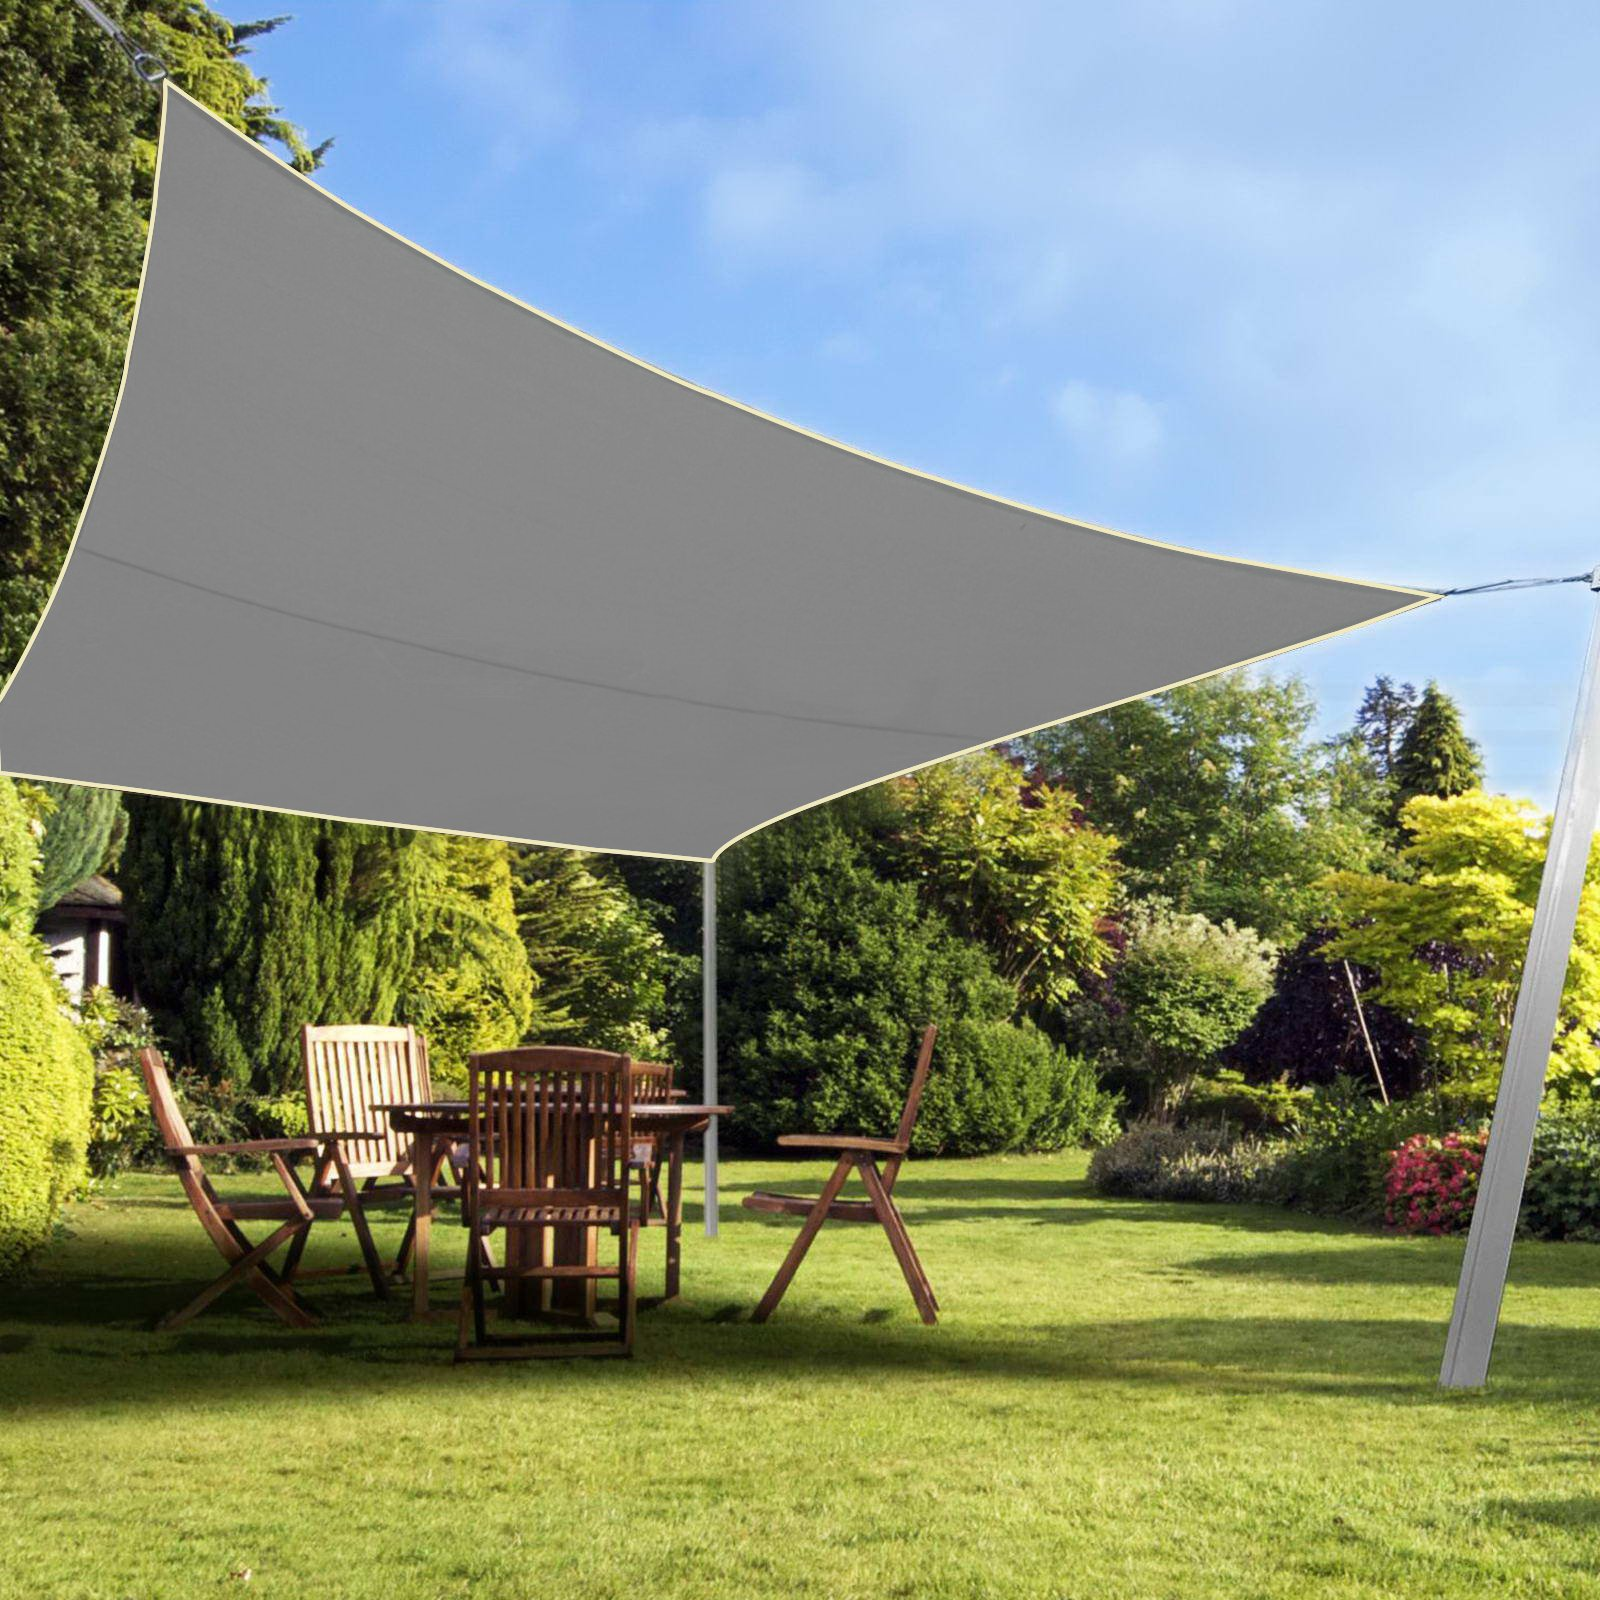 OriginA Patio Shade Panel 10x12ft, Grey, Ready-tie up Ribbon for Pergola/Greenhouses/Carport/Porch